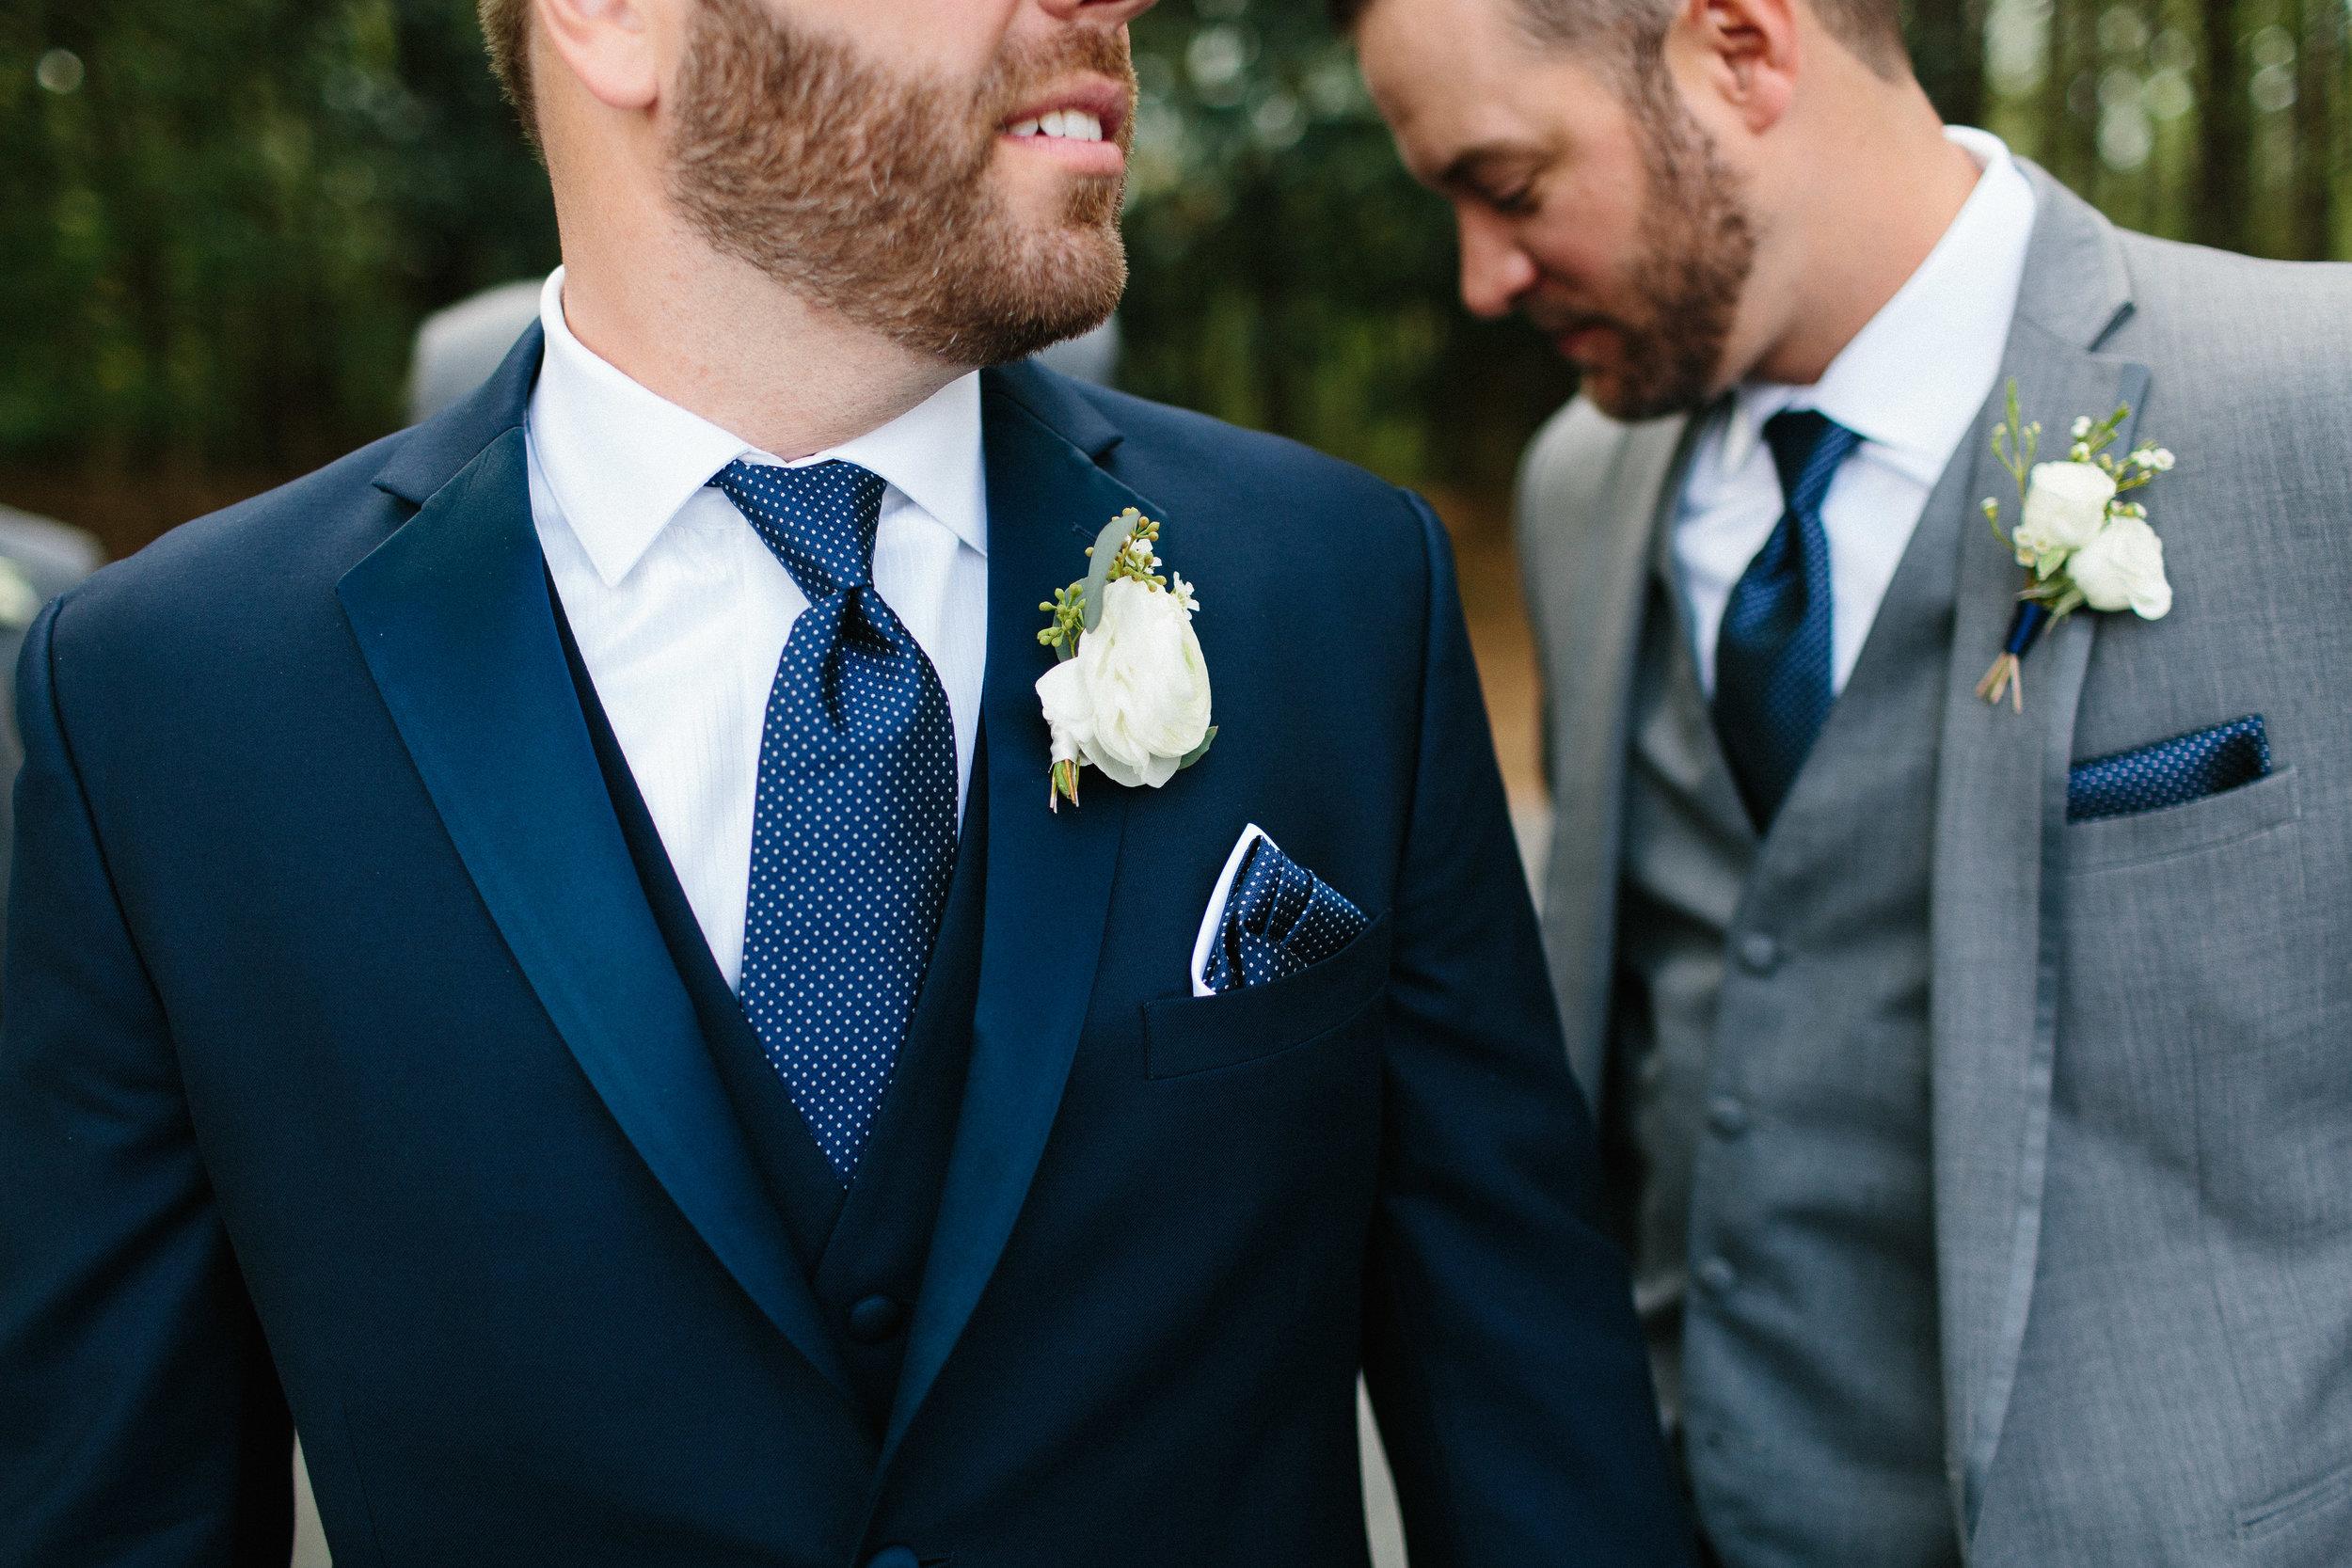 roswell_st_peter_chanel_catholic_avalon_hotel_alpharetta_wedding-1312.jpg